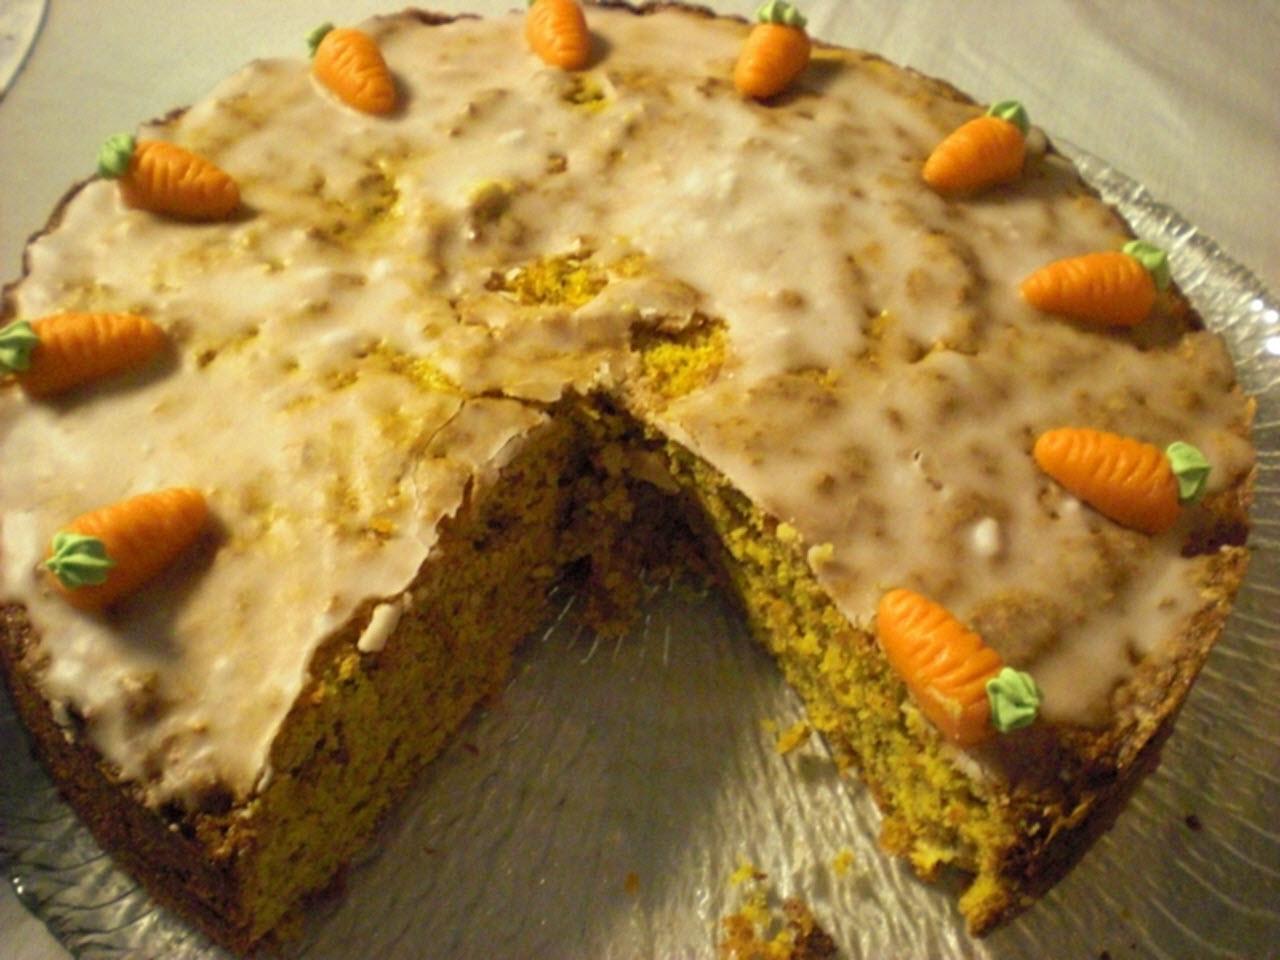 Swiss Almond Carrot Cake (Aargauer Rueblitorte)